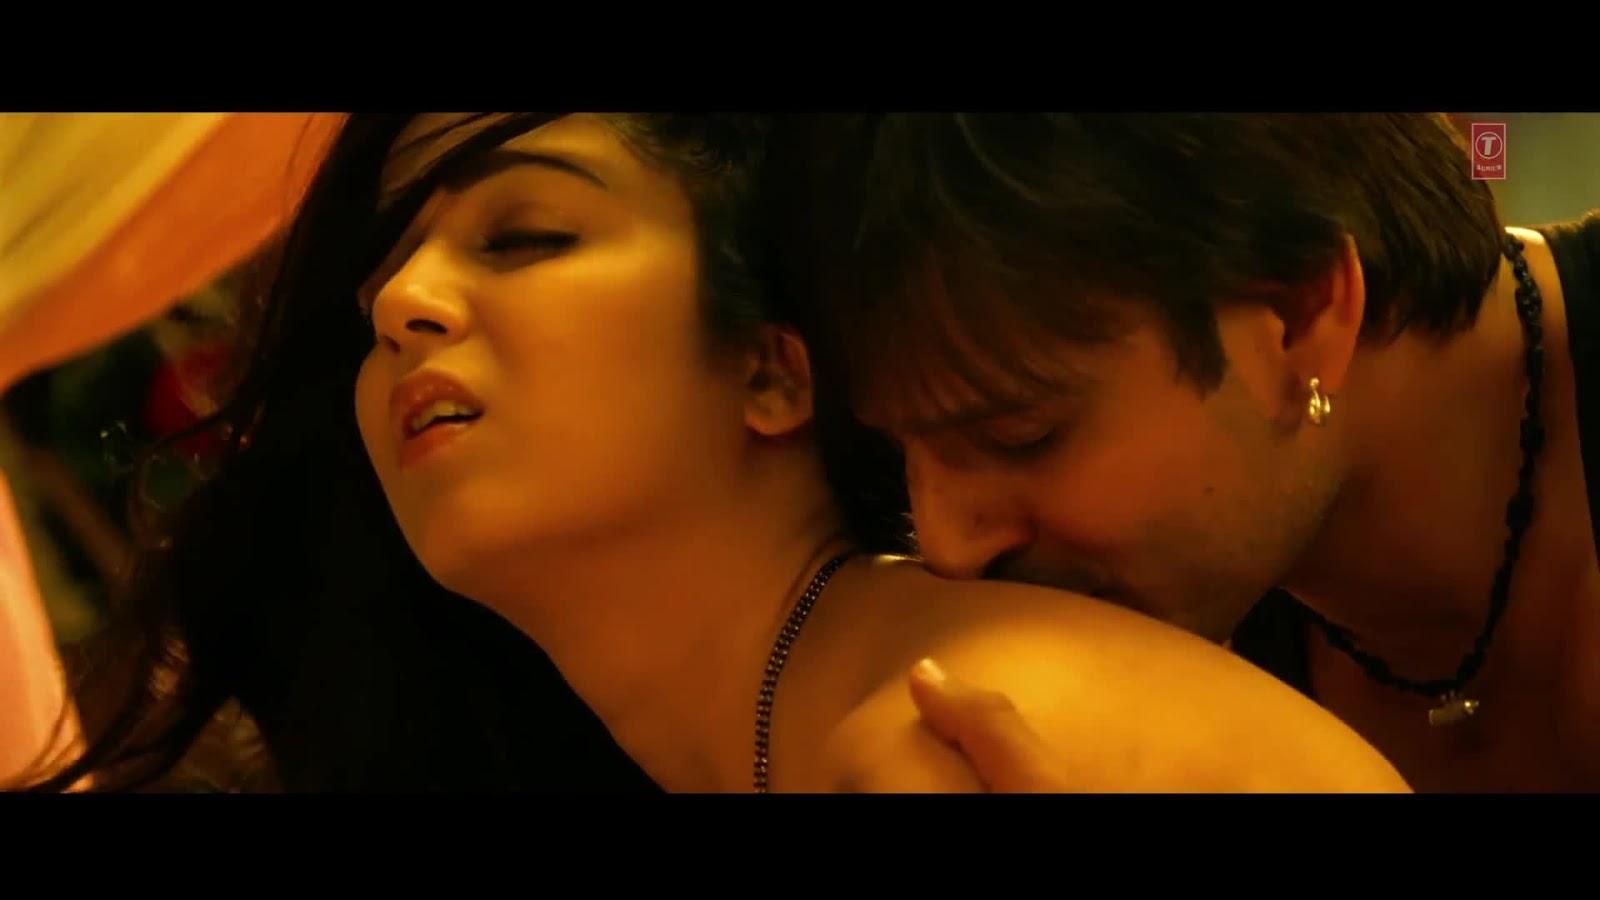 SouthIndian Actress Gallery: Charmi kaur Hot Zila Ghaziabad